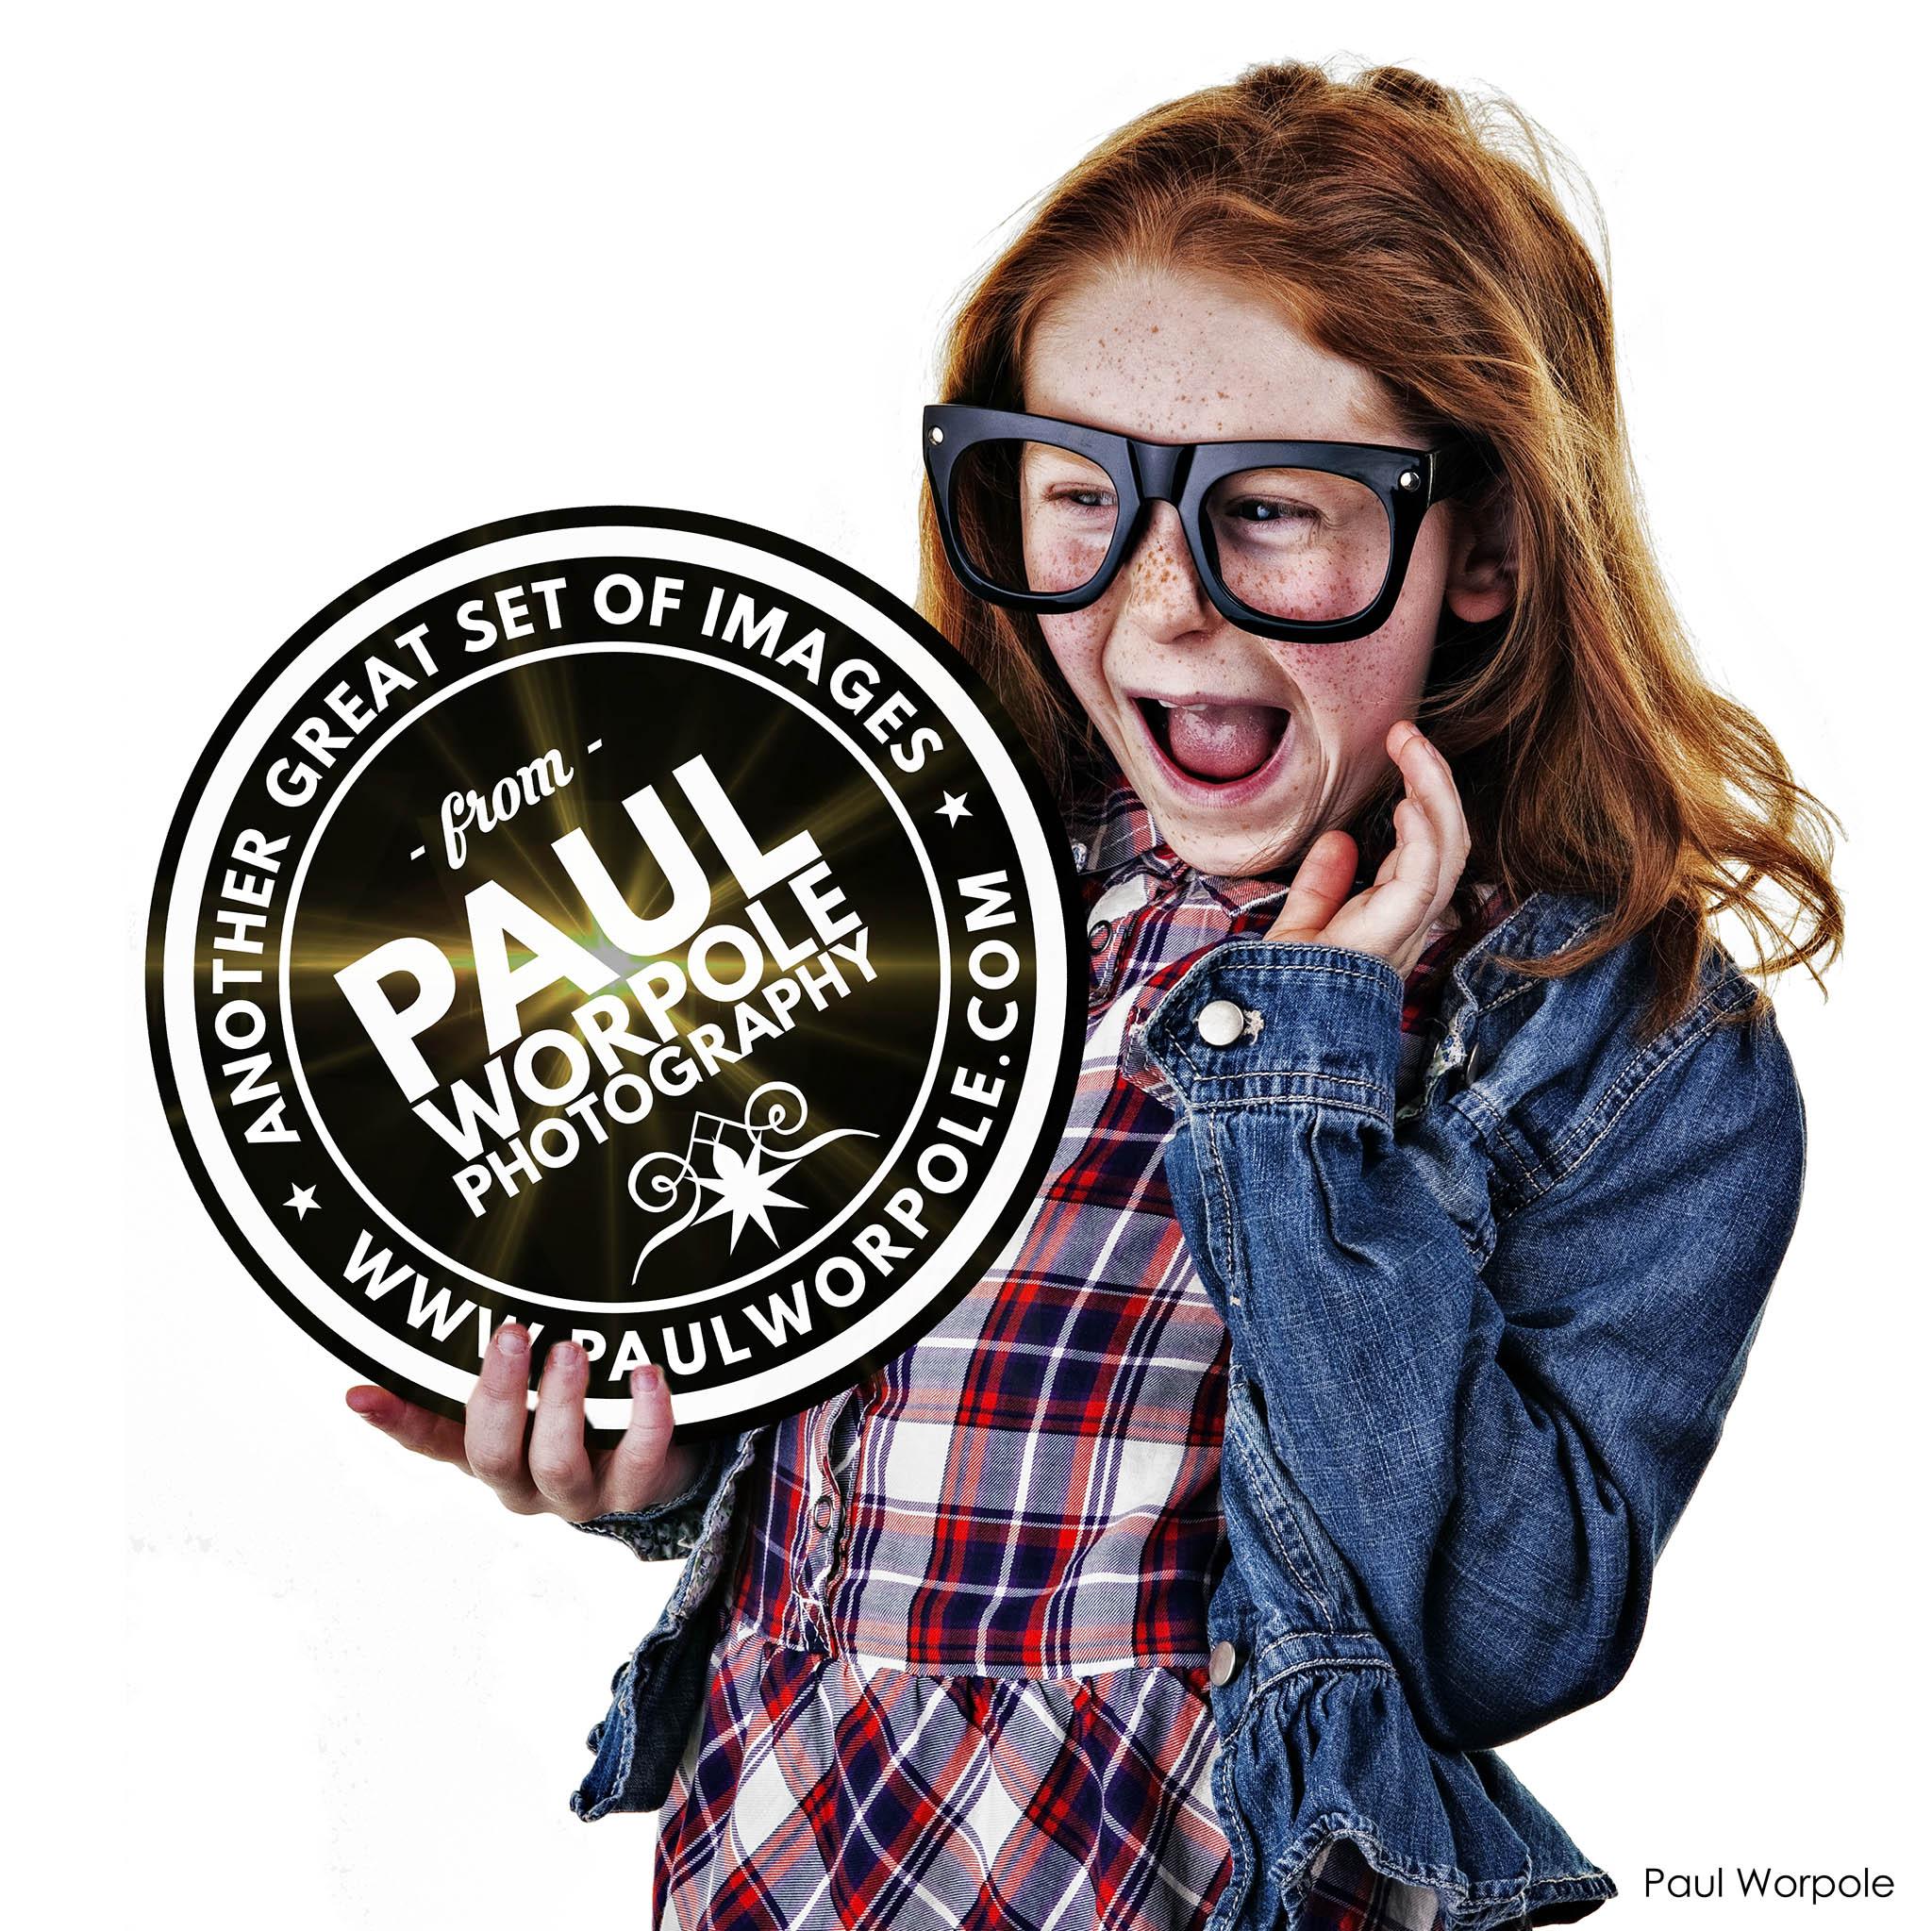 Child with Big Glasses Holding Award